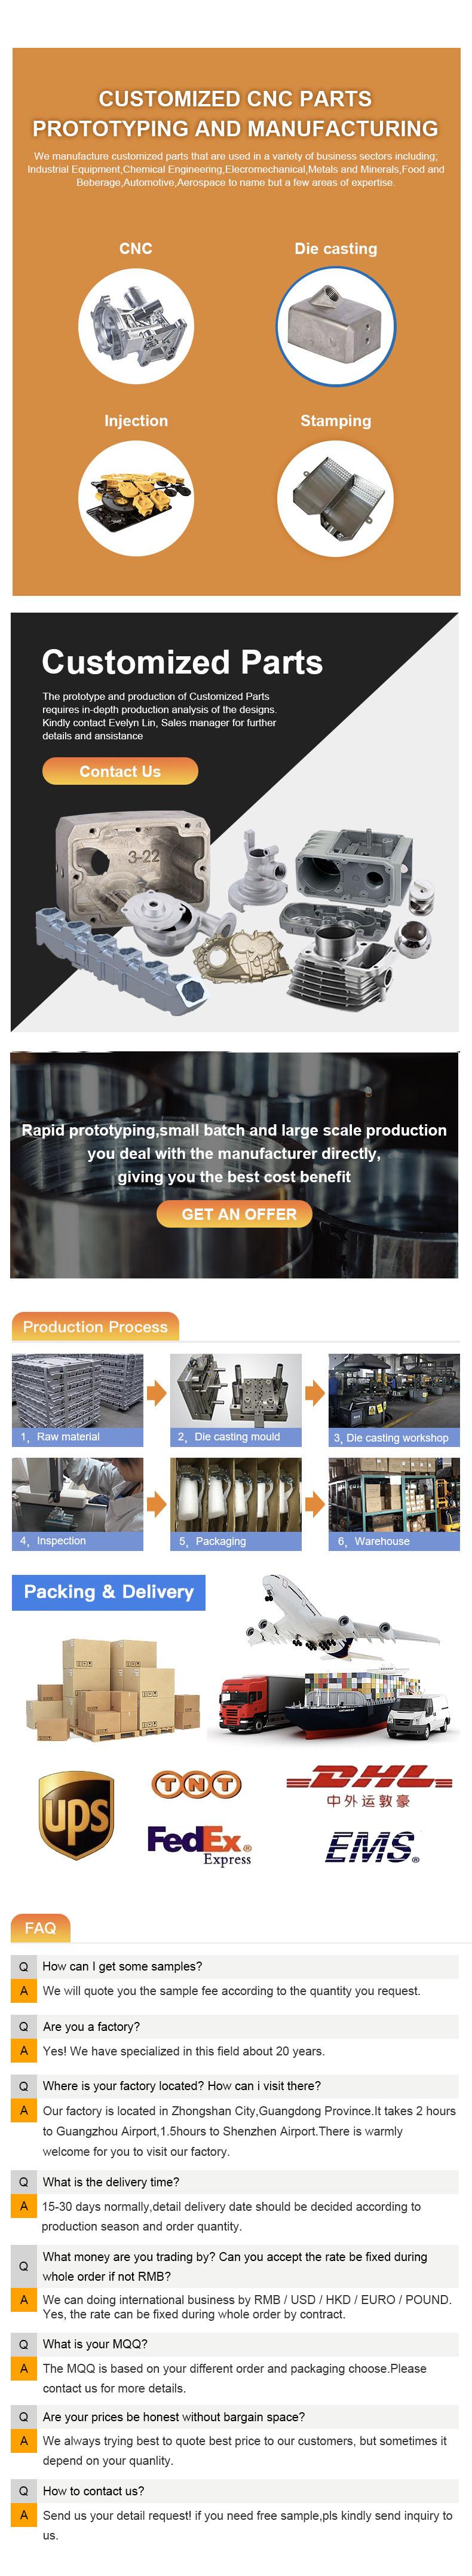 aluminum die casting part,CNC MACHINING PARTS,PRECISION CNC MACHINING PARTS,CNC ALUMINUM PARTS,Machined Products,CNC Machined Products,BoYang Hardware Products